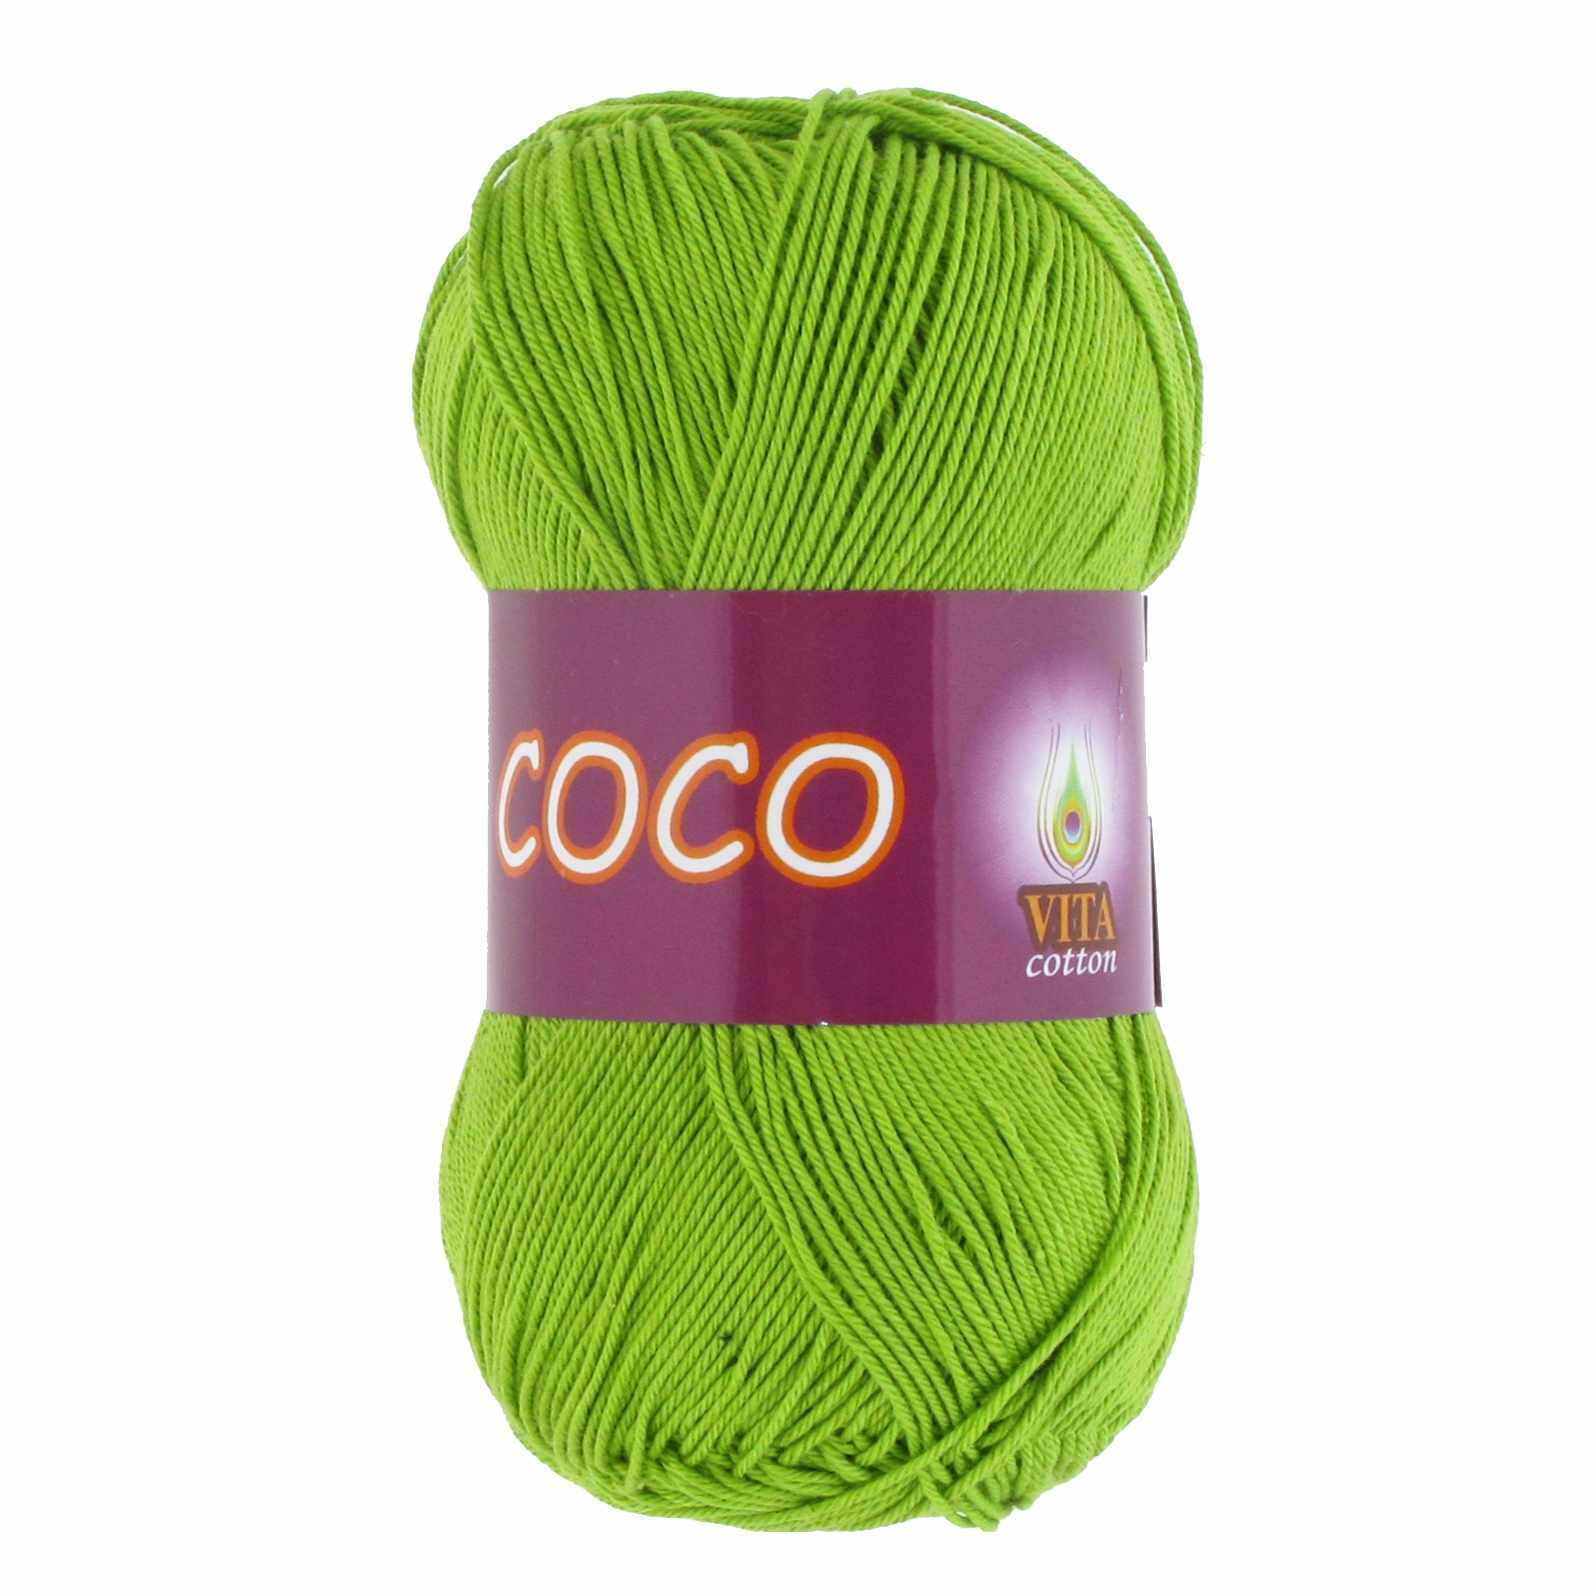 Пряжа VITA Coco Цвет.3861 Ярко-зеленый